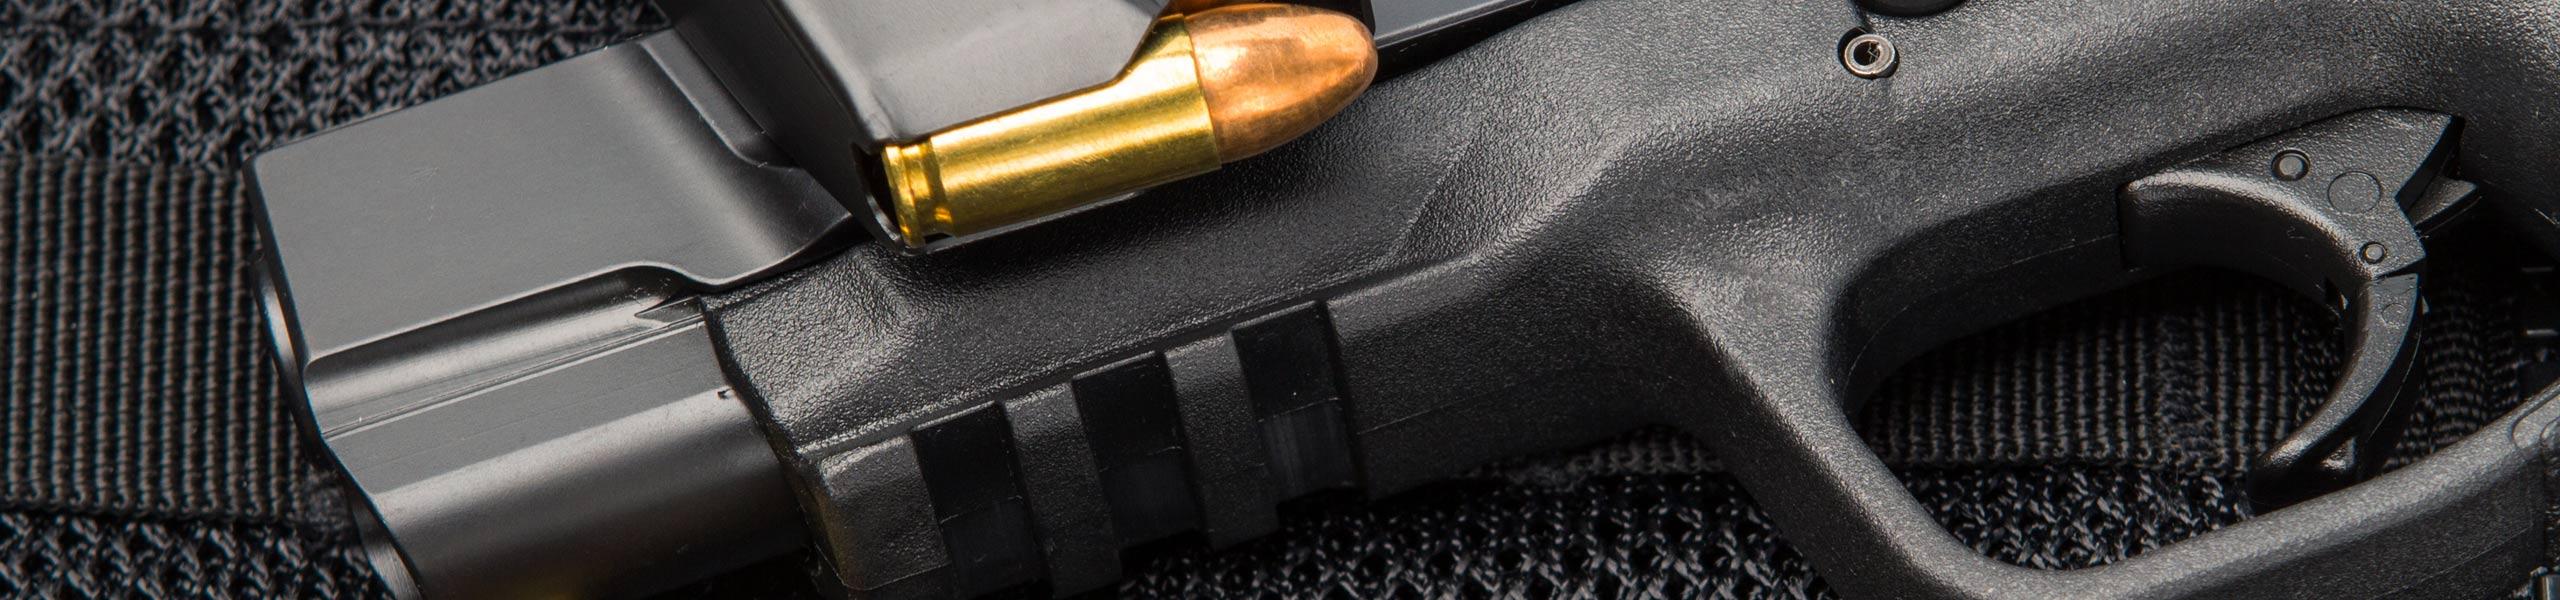 Waffen Hölzl | Jagd, Schiesssport, Sicherheit, Waffenhändler